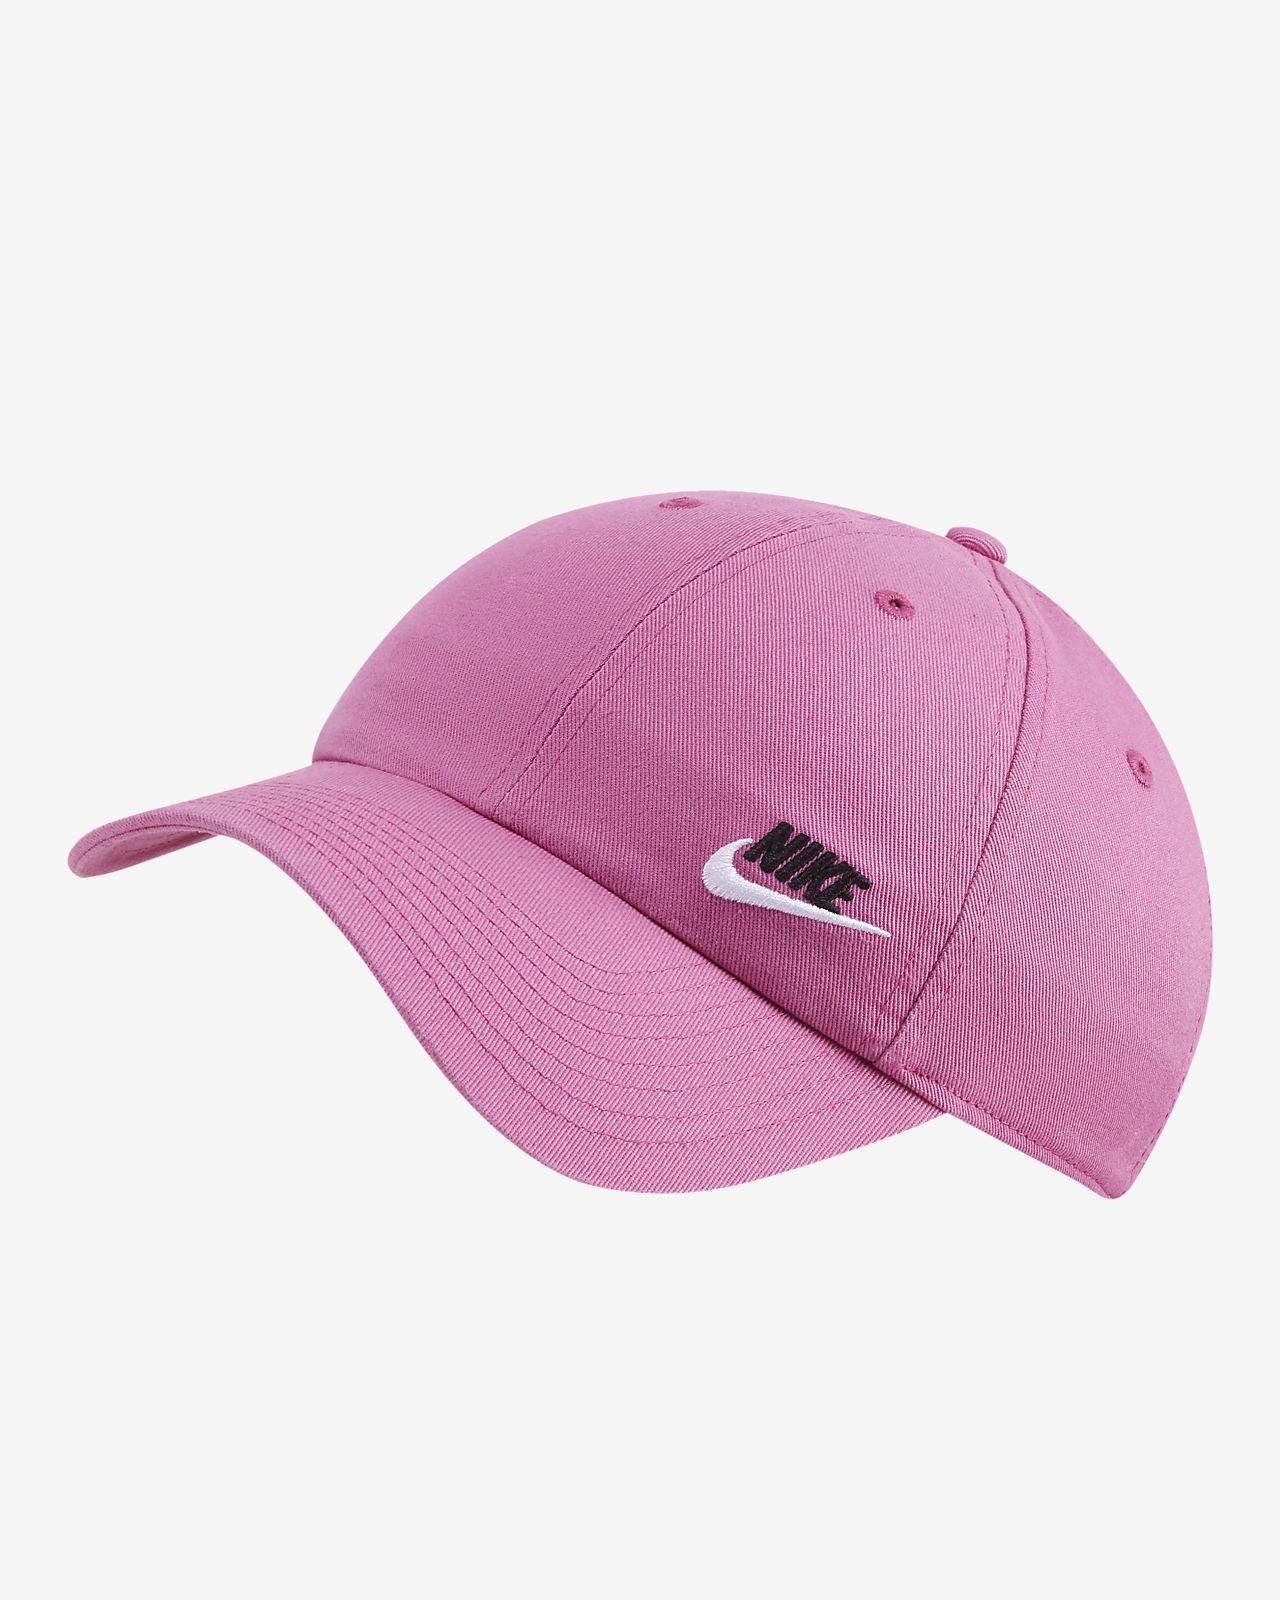 Nike Sportswear Heritage 86 Futura Adjustable Hat